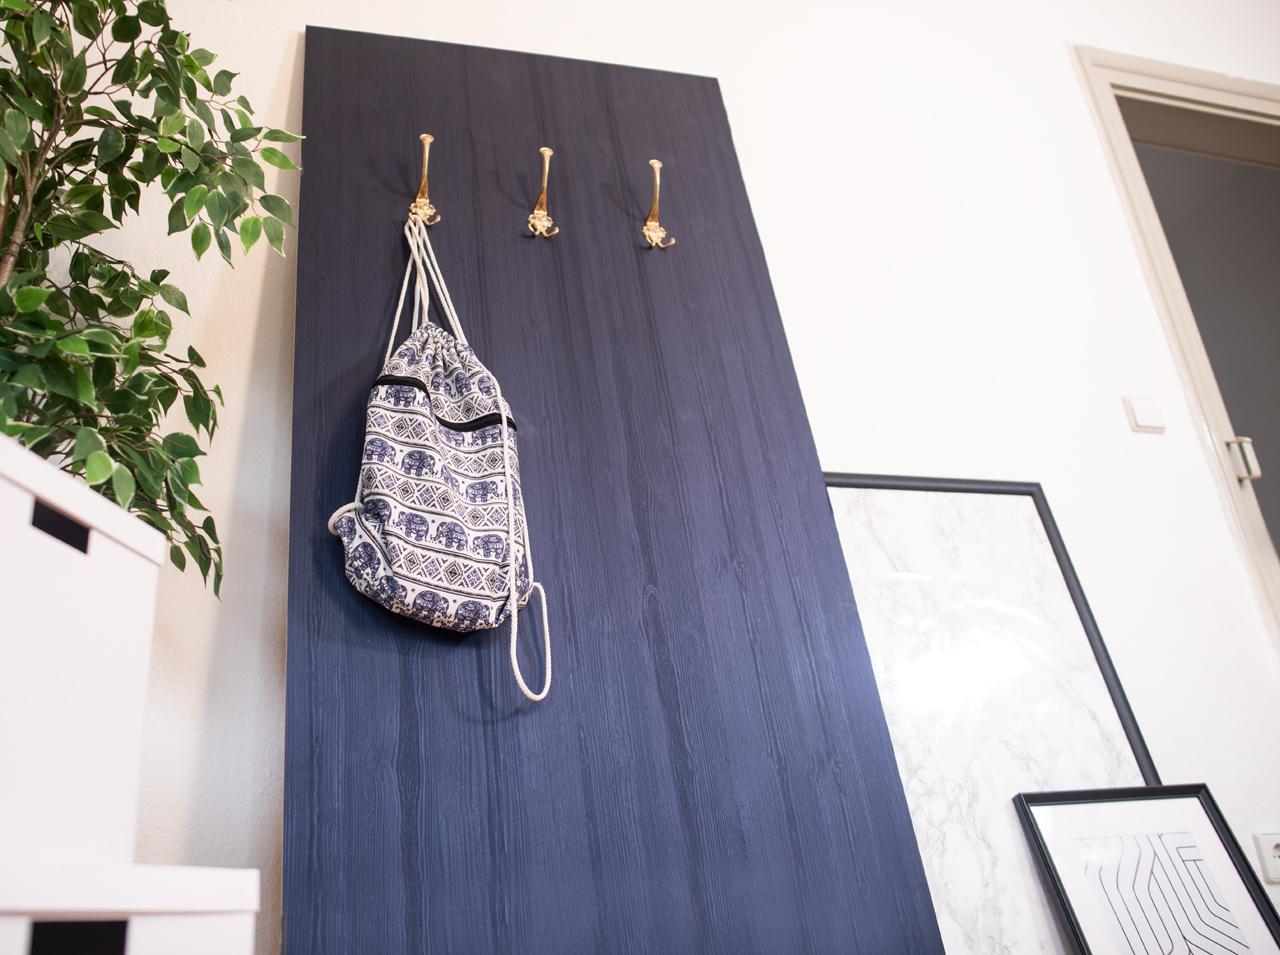 Mit d-c-fix® Dekofolie beklebtes Wandpaneel mit Kleiderhaken als DIY Garderobe in Holzoptik